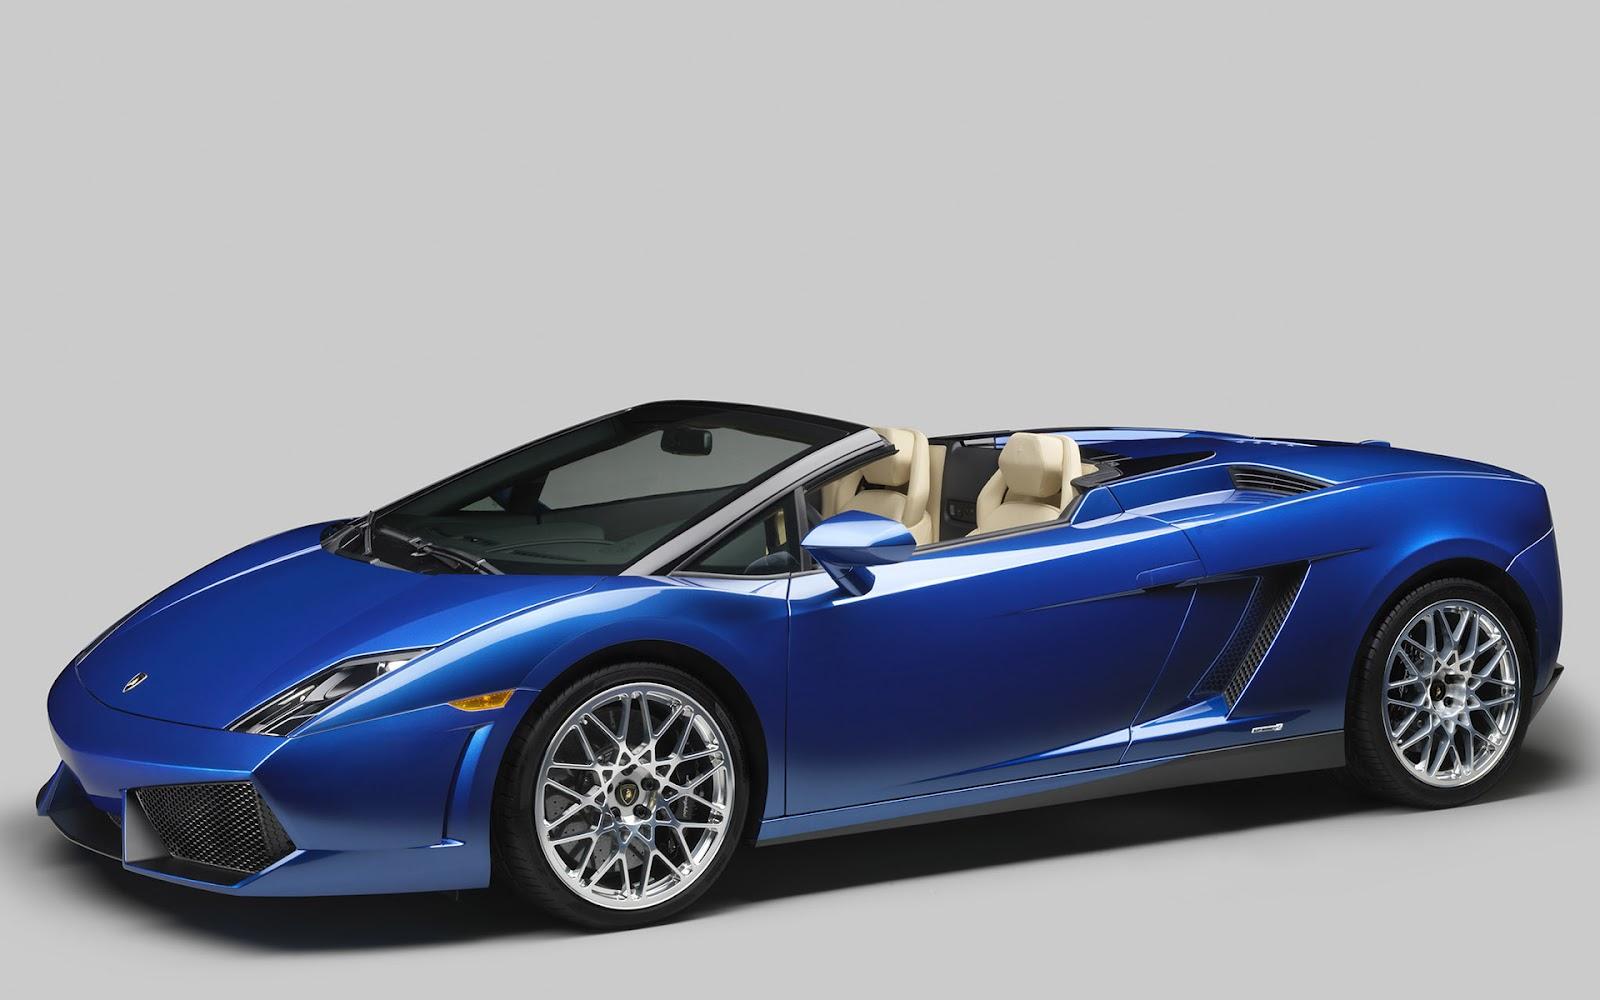 http://1.bp.blogspot.com/-rCMnC9538tY/T59OWr_yr1I/AAAAAAAAbWs/1909EogHkFU/s1600/Lamborghini-Gallardo-LP-550-2-Spyder.jpg